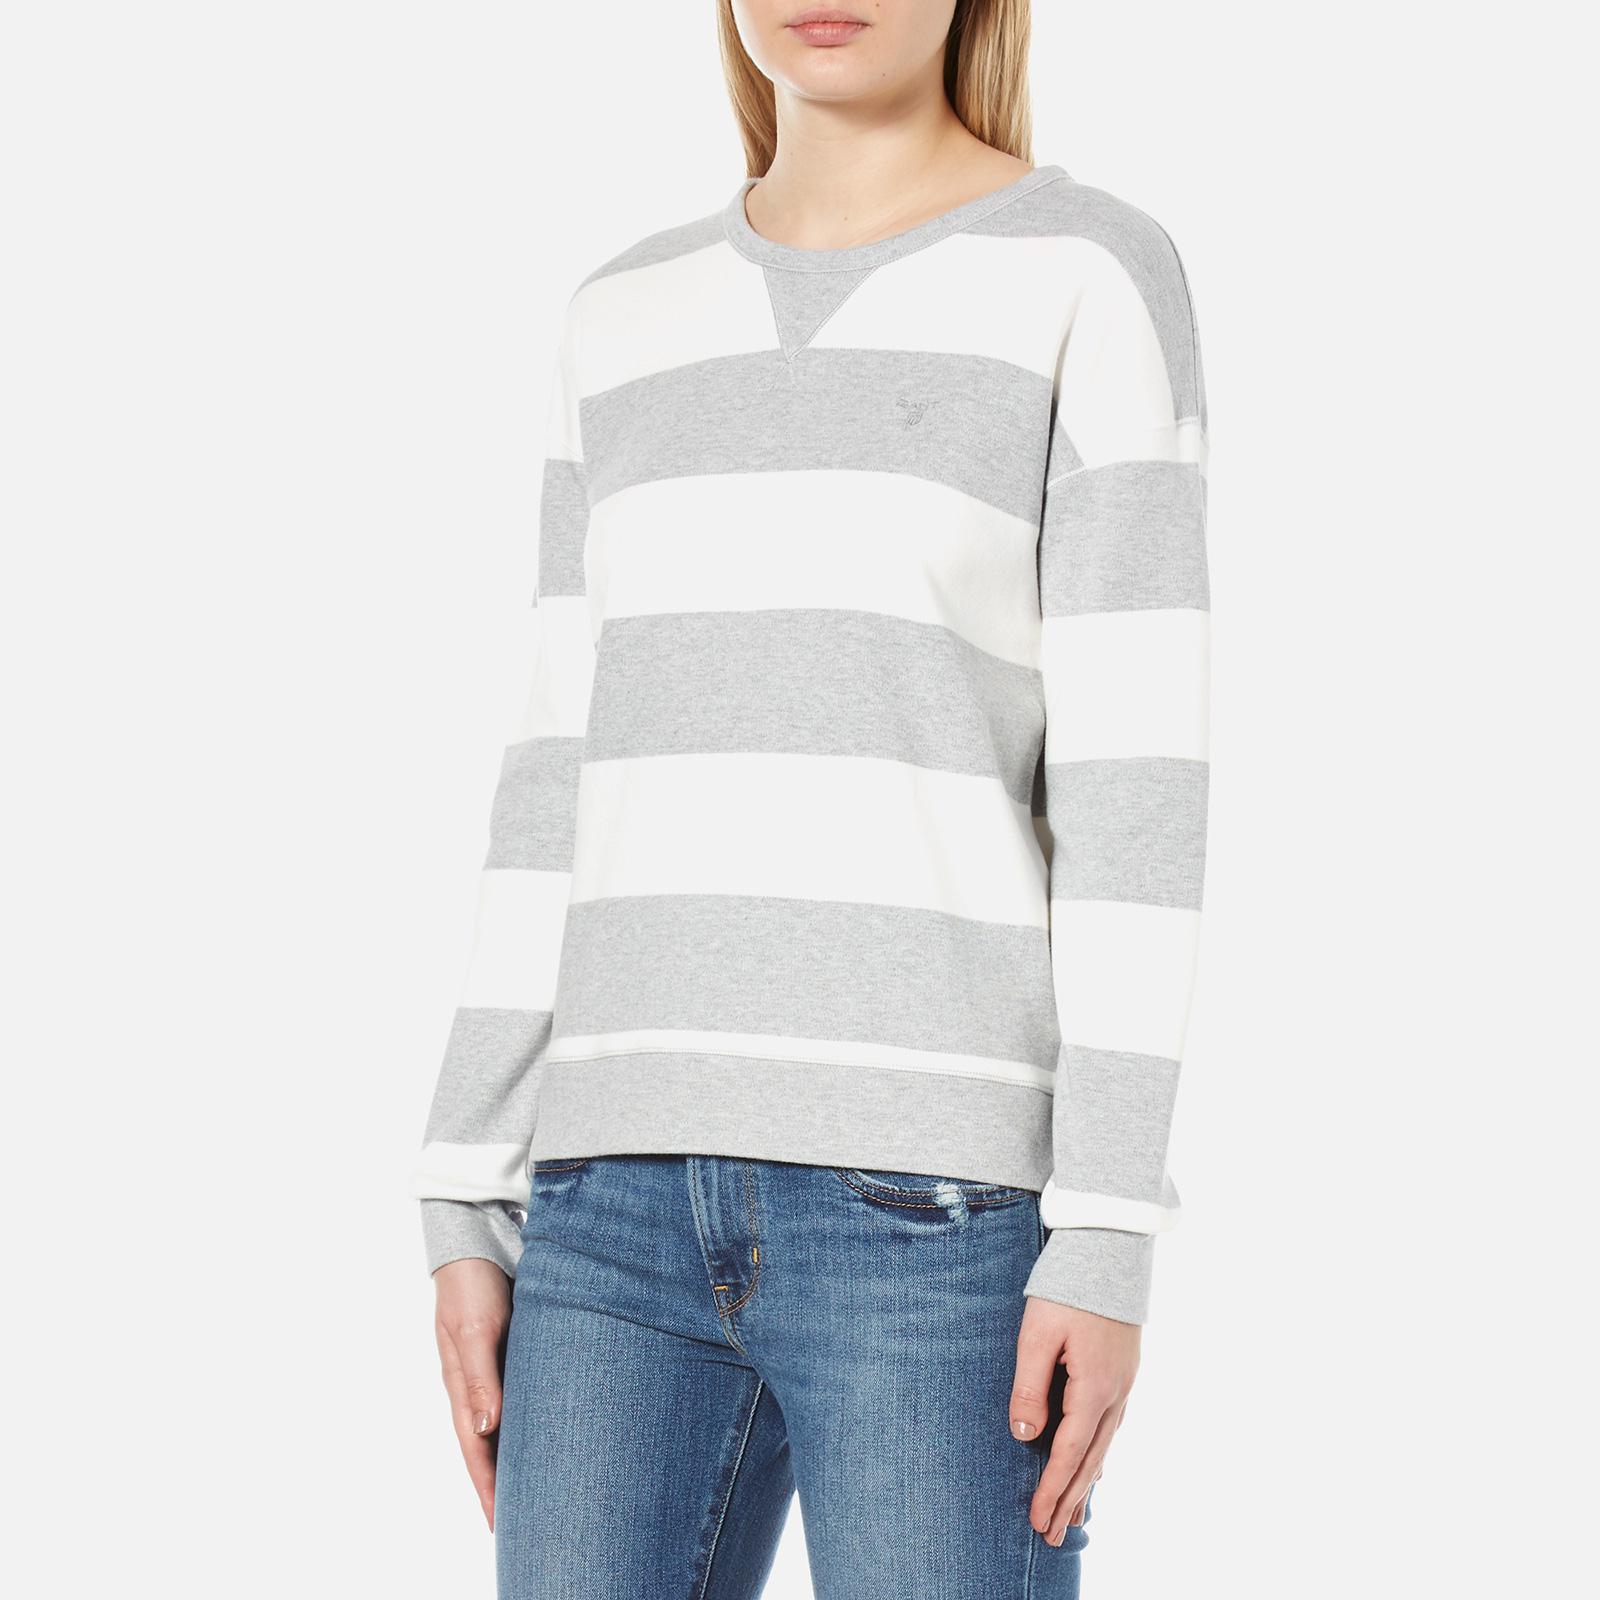 4c9b81641da GANT O2 Barstripe C-neck Sweatshirt in Gray - Lyst